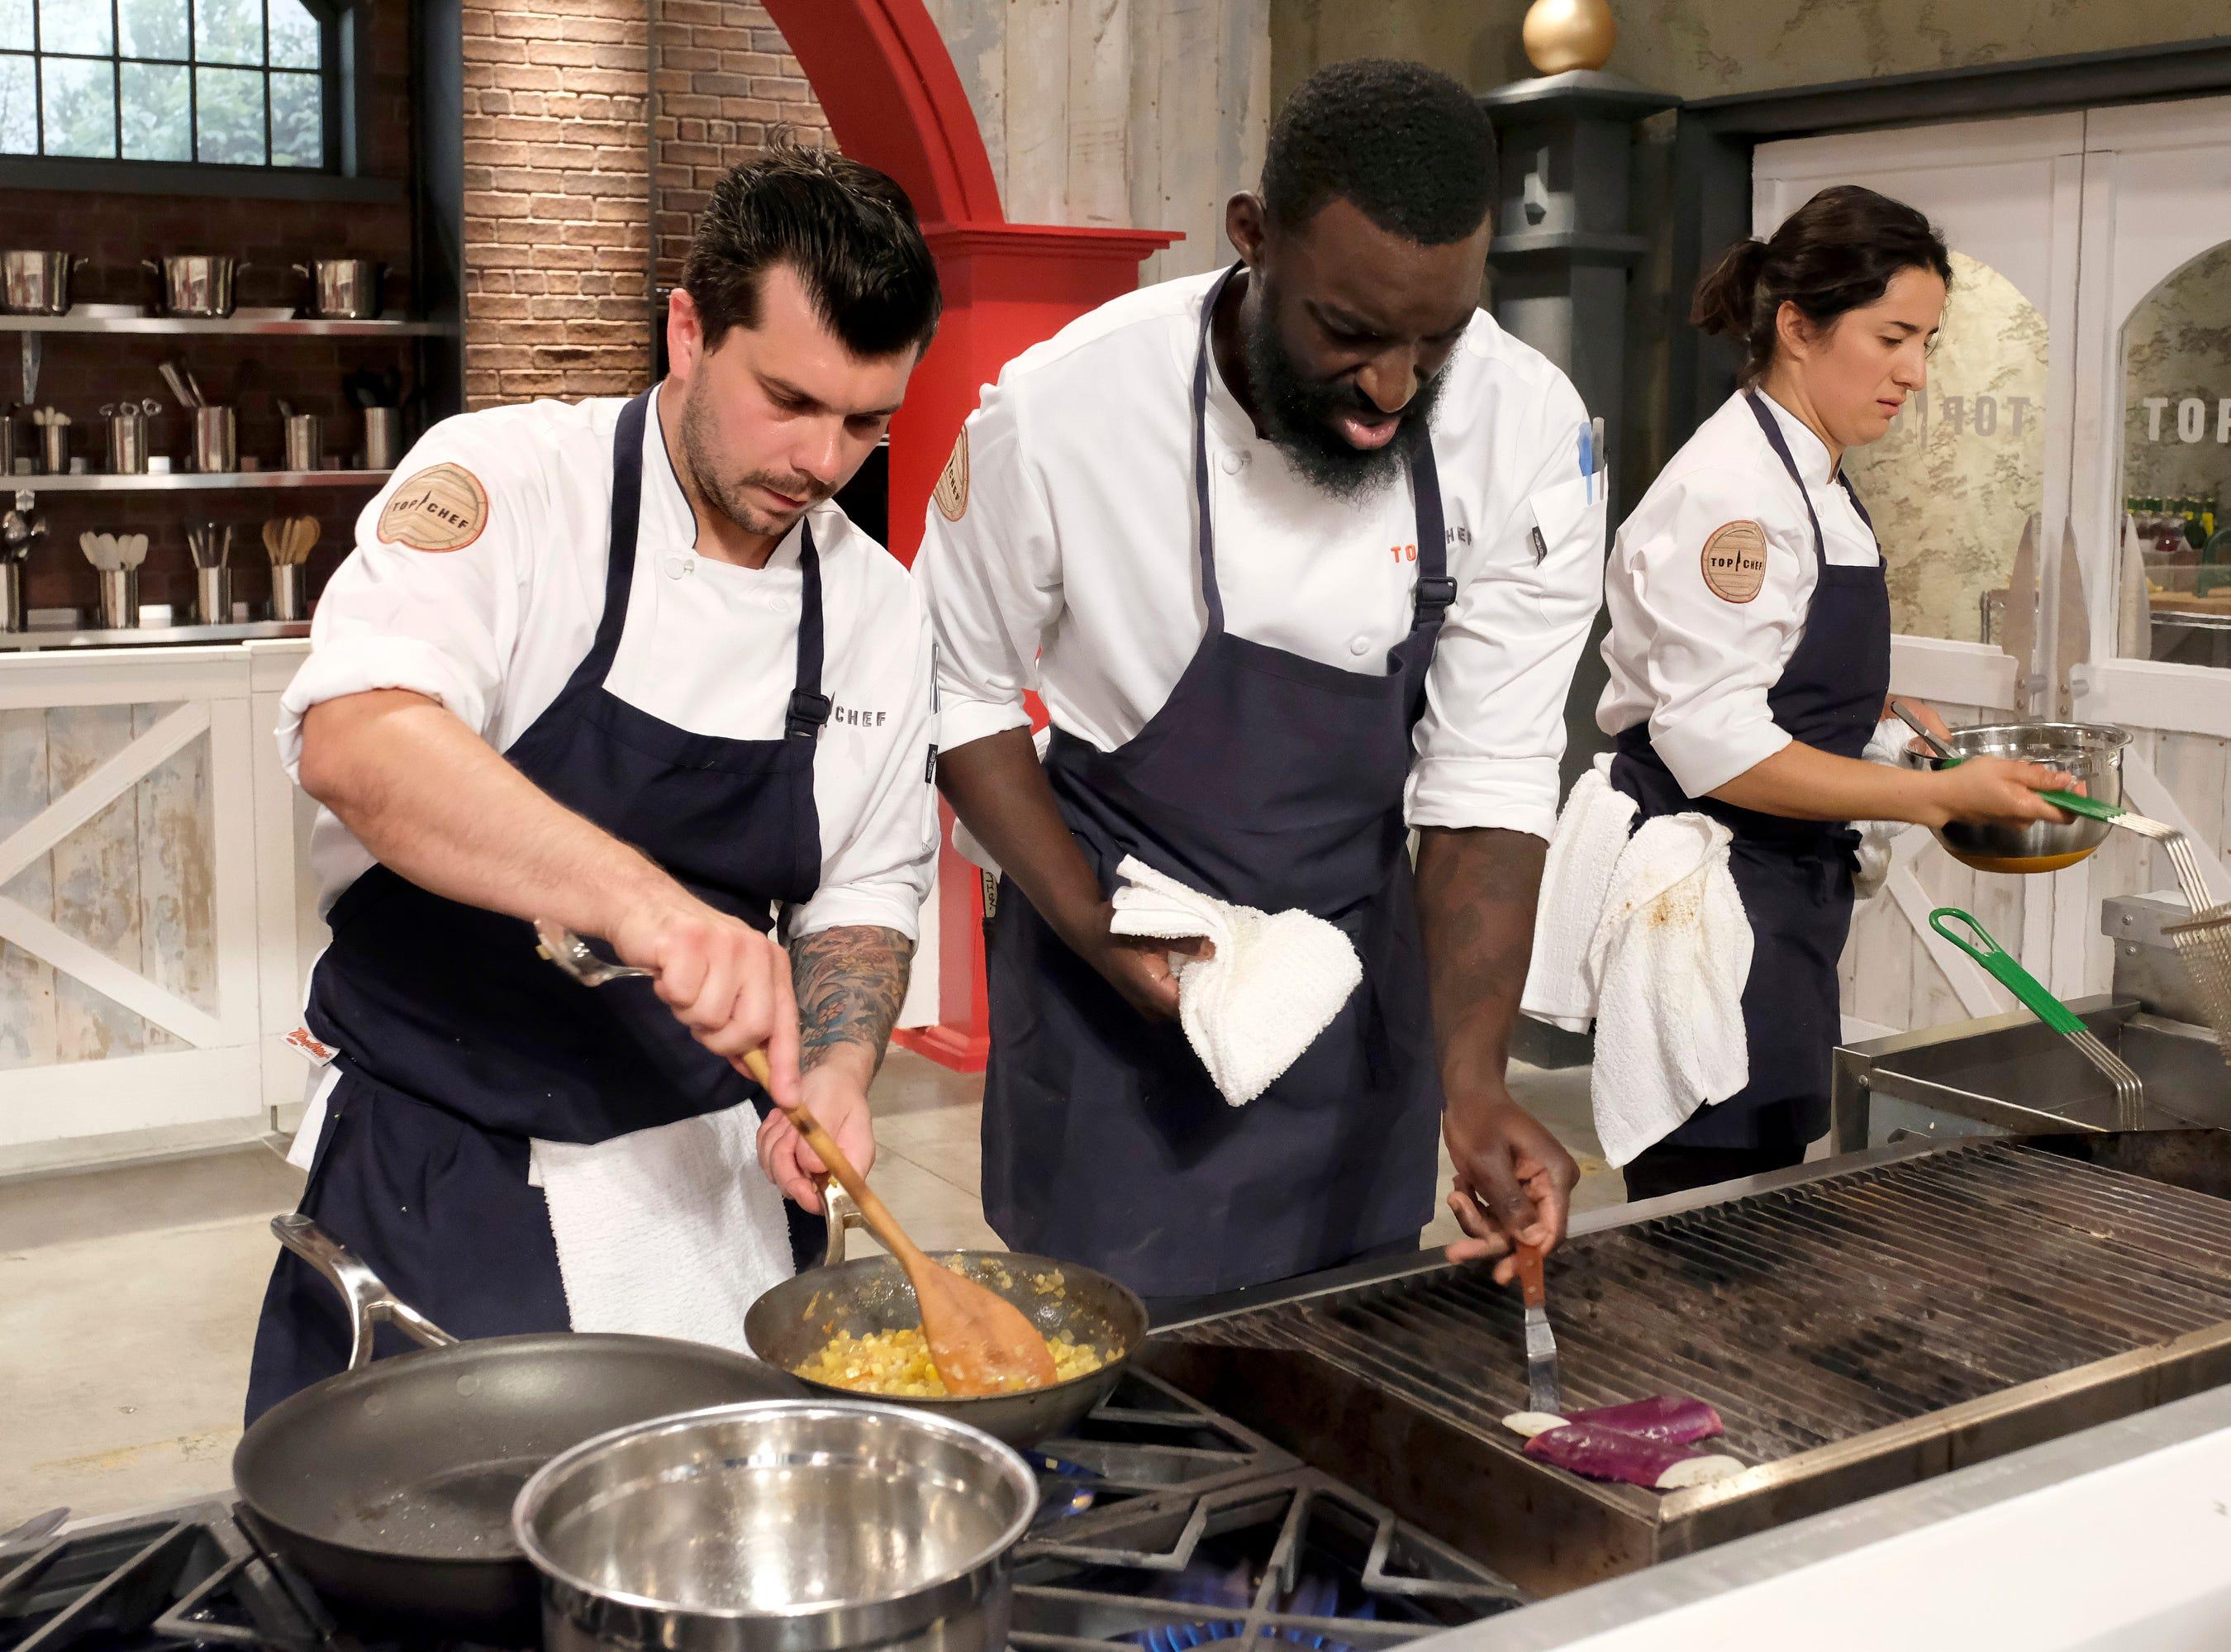 (From left to right): Contestants Eddie Konrad, Eric Adjepong and Michelle Minori on episode 10 of Bravo's 'Top Chef: Kentucky' season.